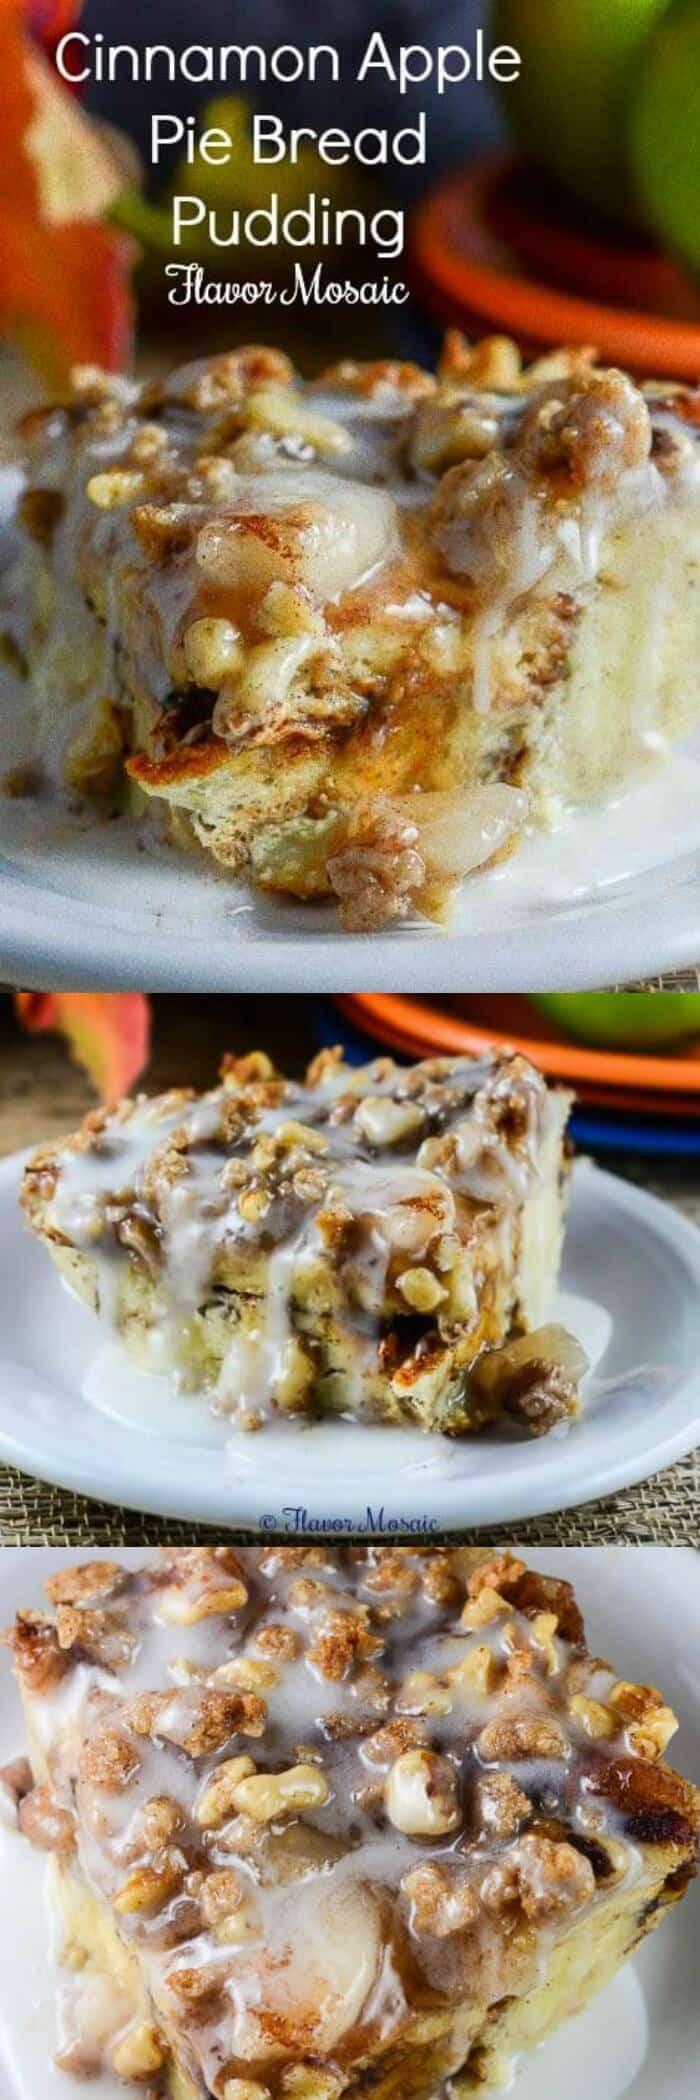 Apple Pie Bread Pudding  Cinnamon Apple Pie Bread Pudding Flavor Mosaic